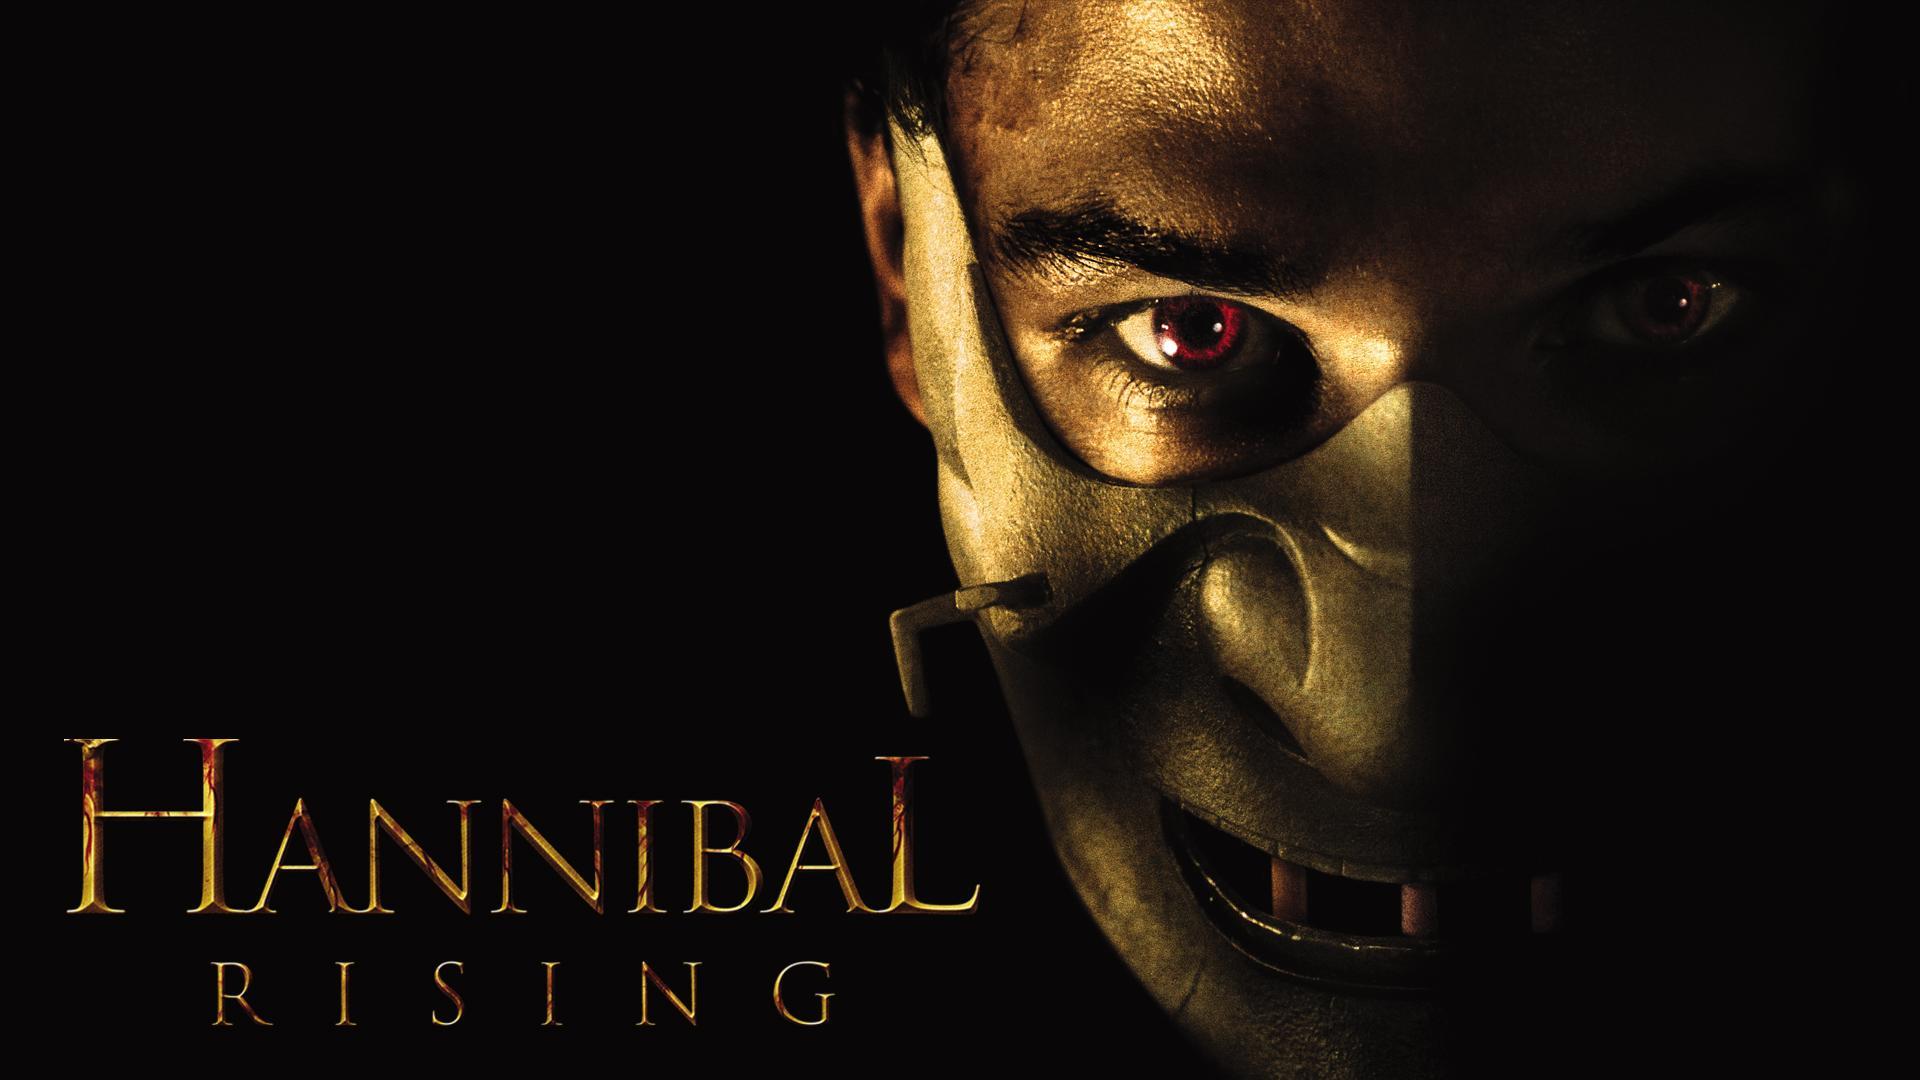 Hannibal Rising - Hannibal ébredése (2007)